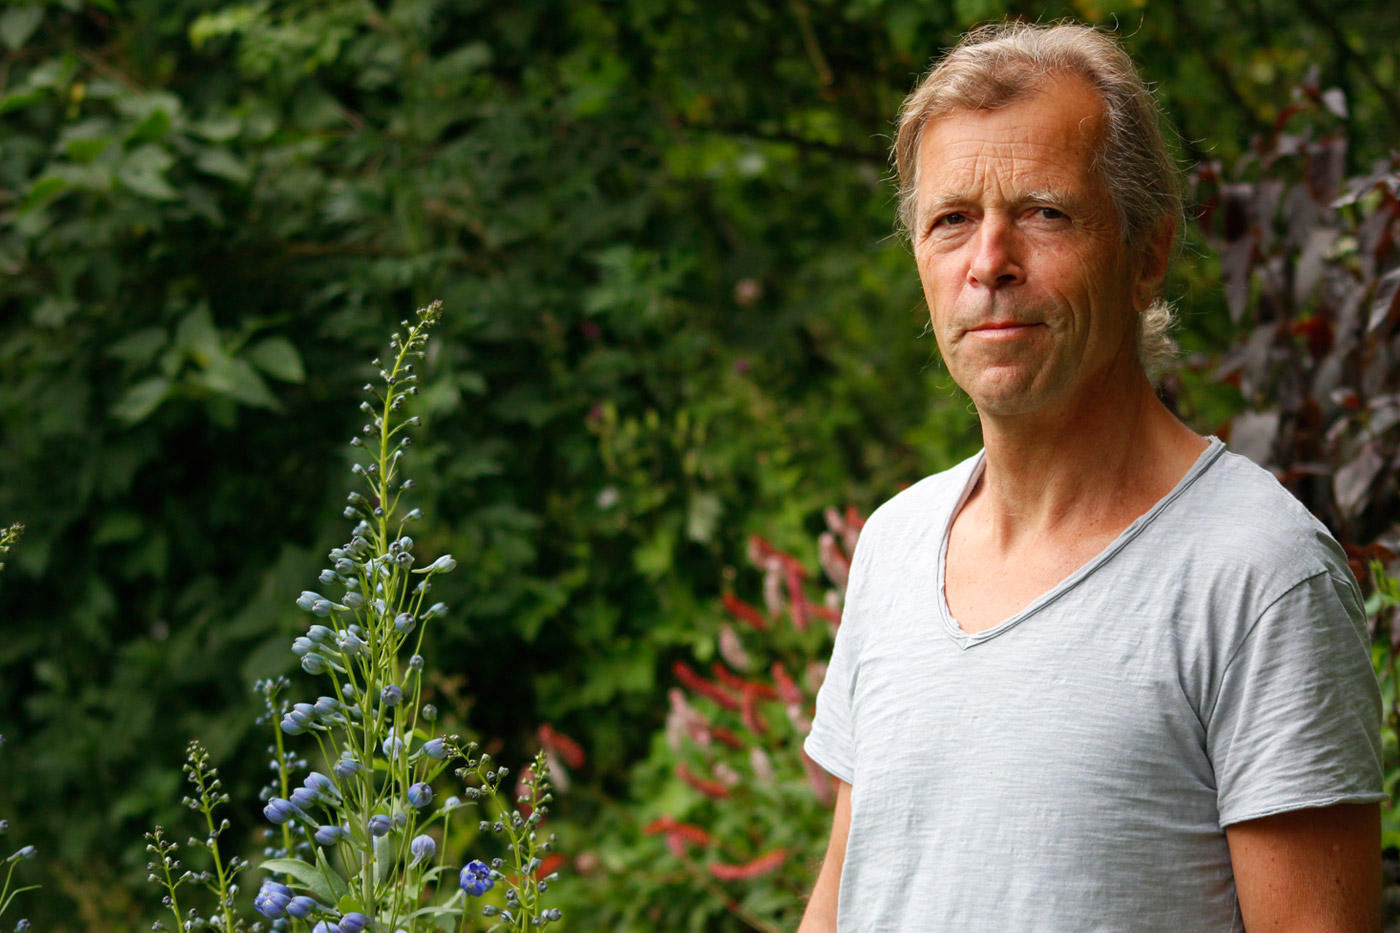 Thomas Jörgen Burghardt Feng Shui Gärten